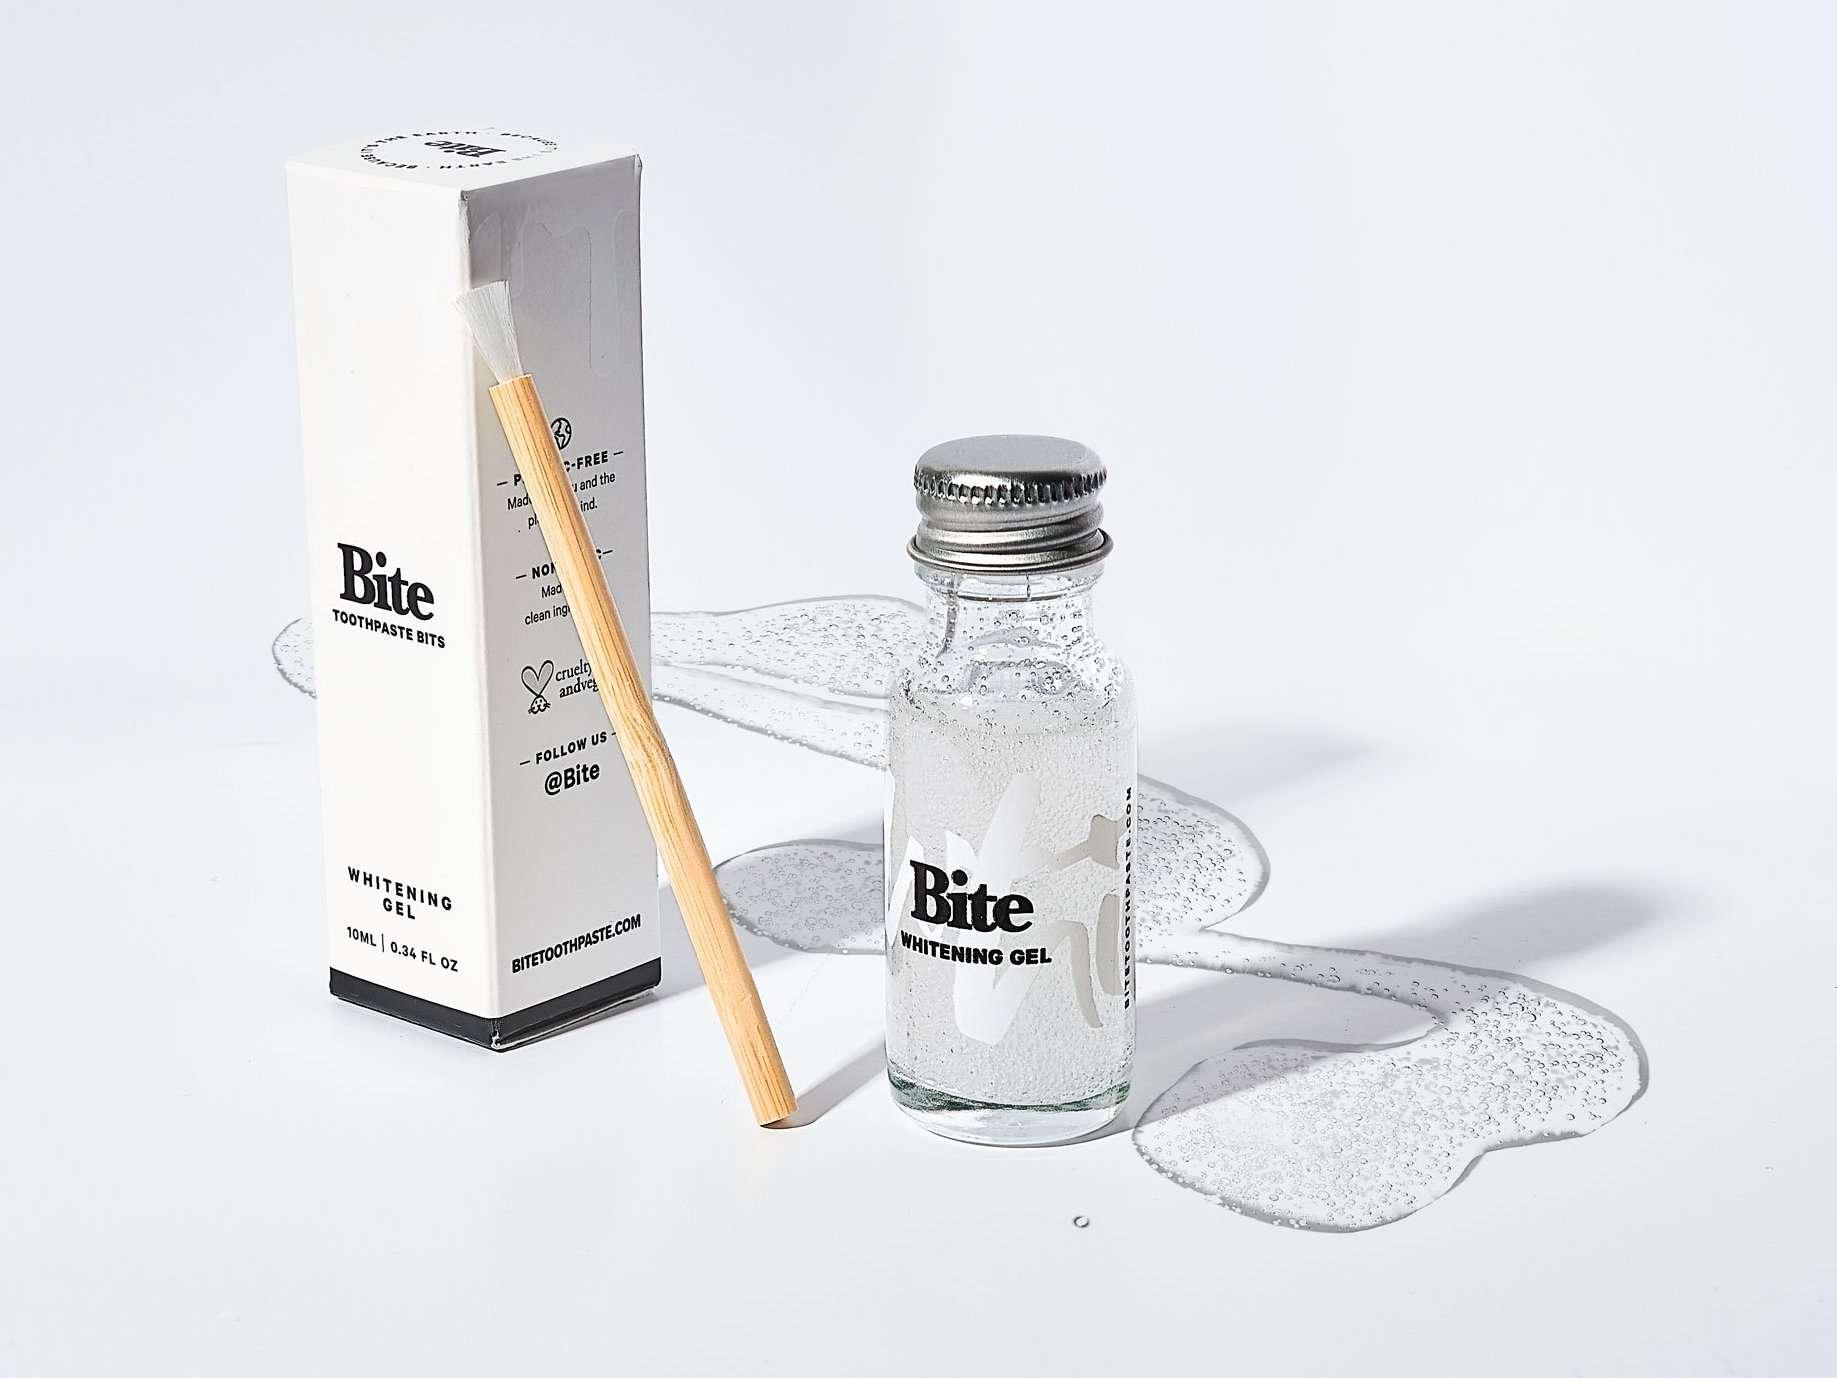 Bite Whitening Gel